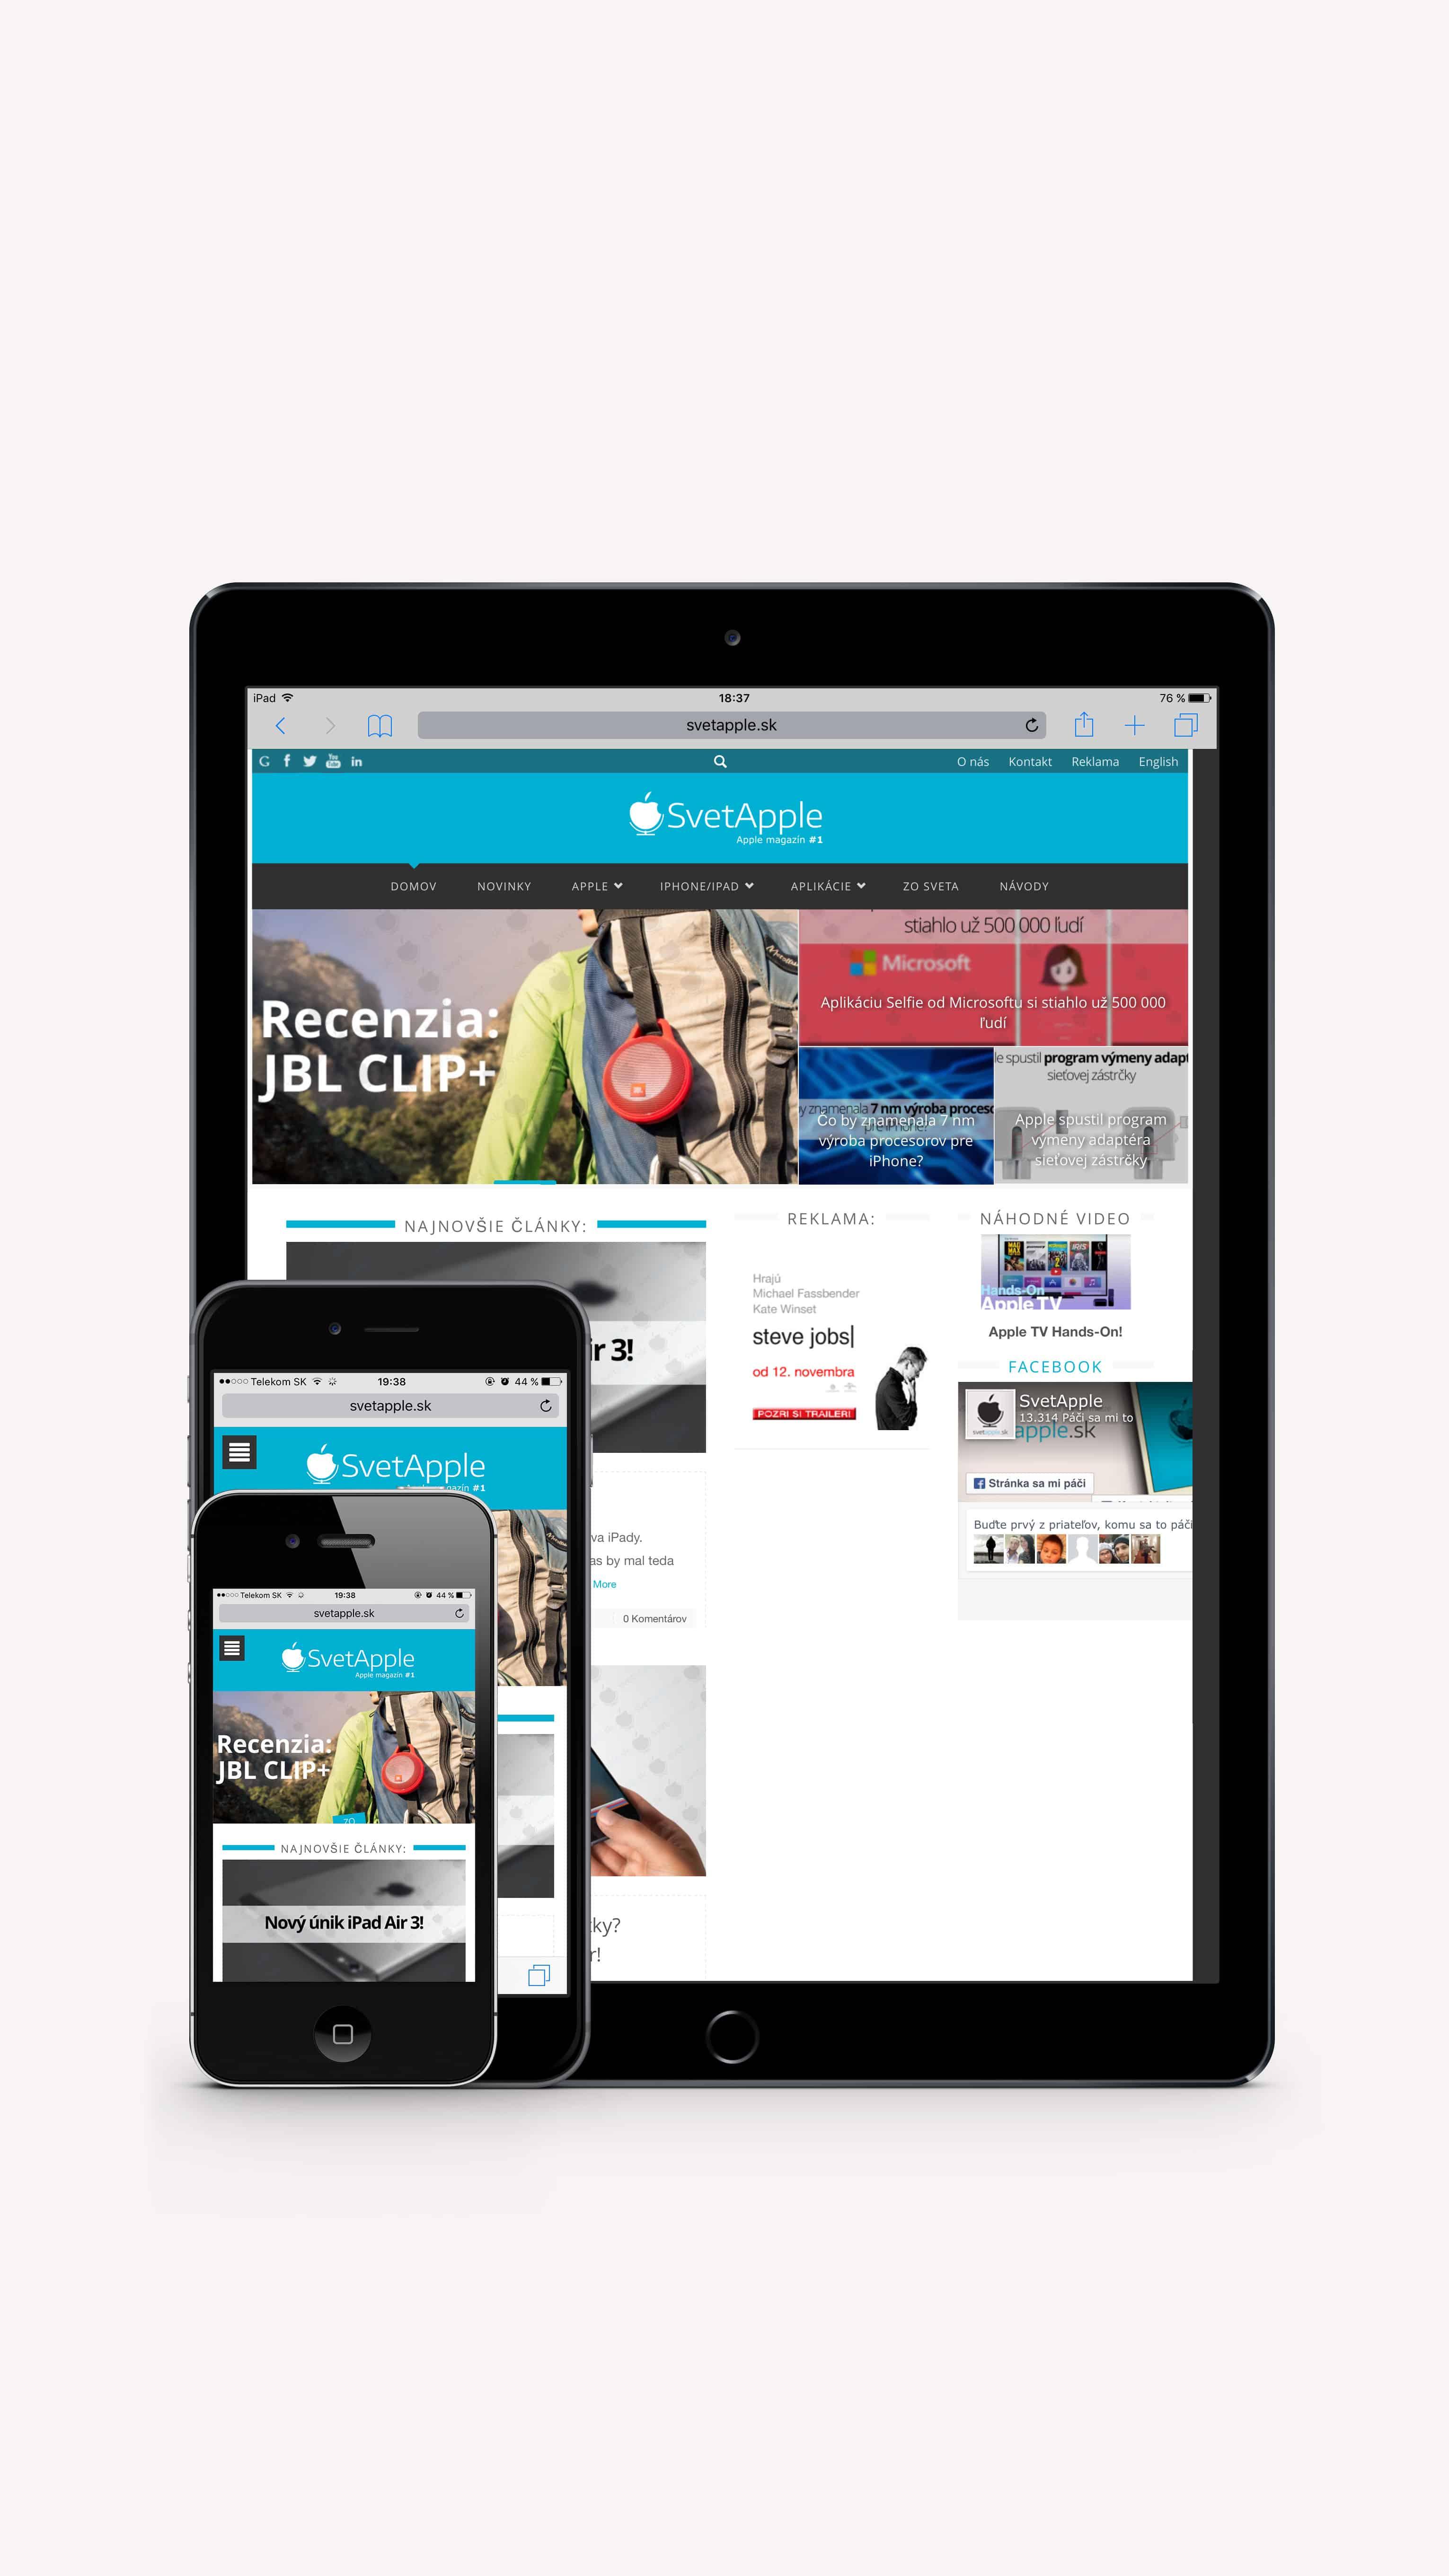 iphone-4-iphone-6-Plus-iPad-Pro - SvetApple